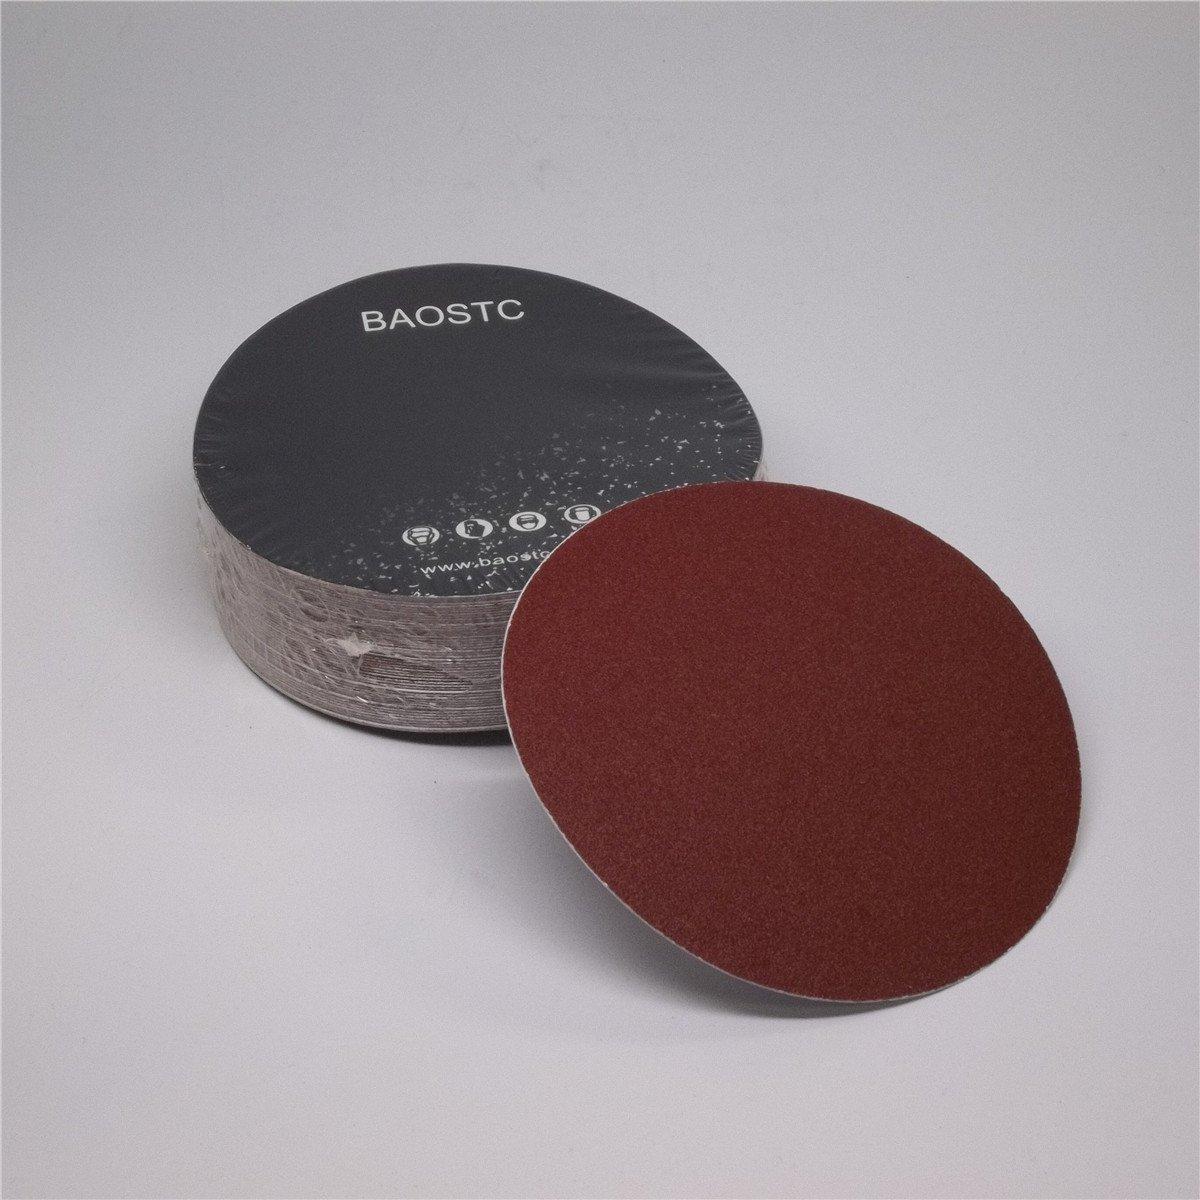 BAOSTC 5'' no holes P80 PSA sanding disc,red aluminum oxide 50PACK